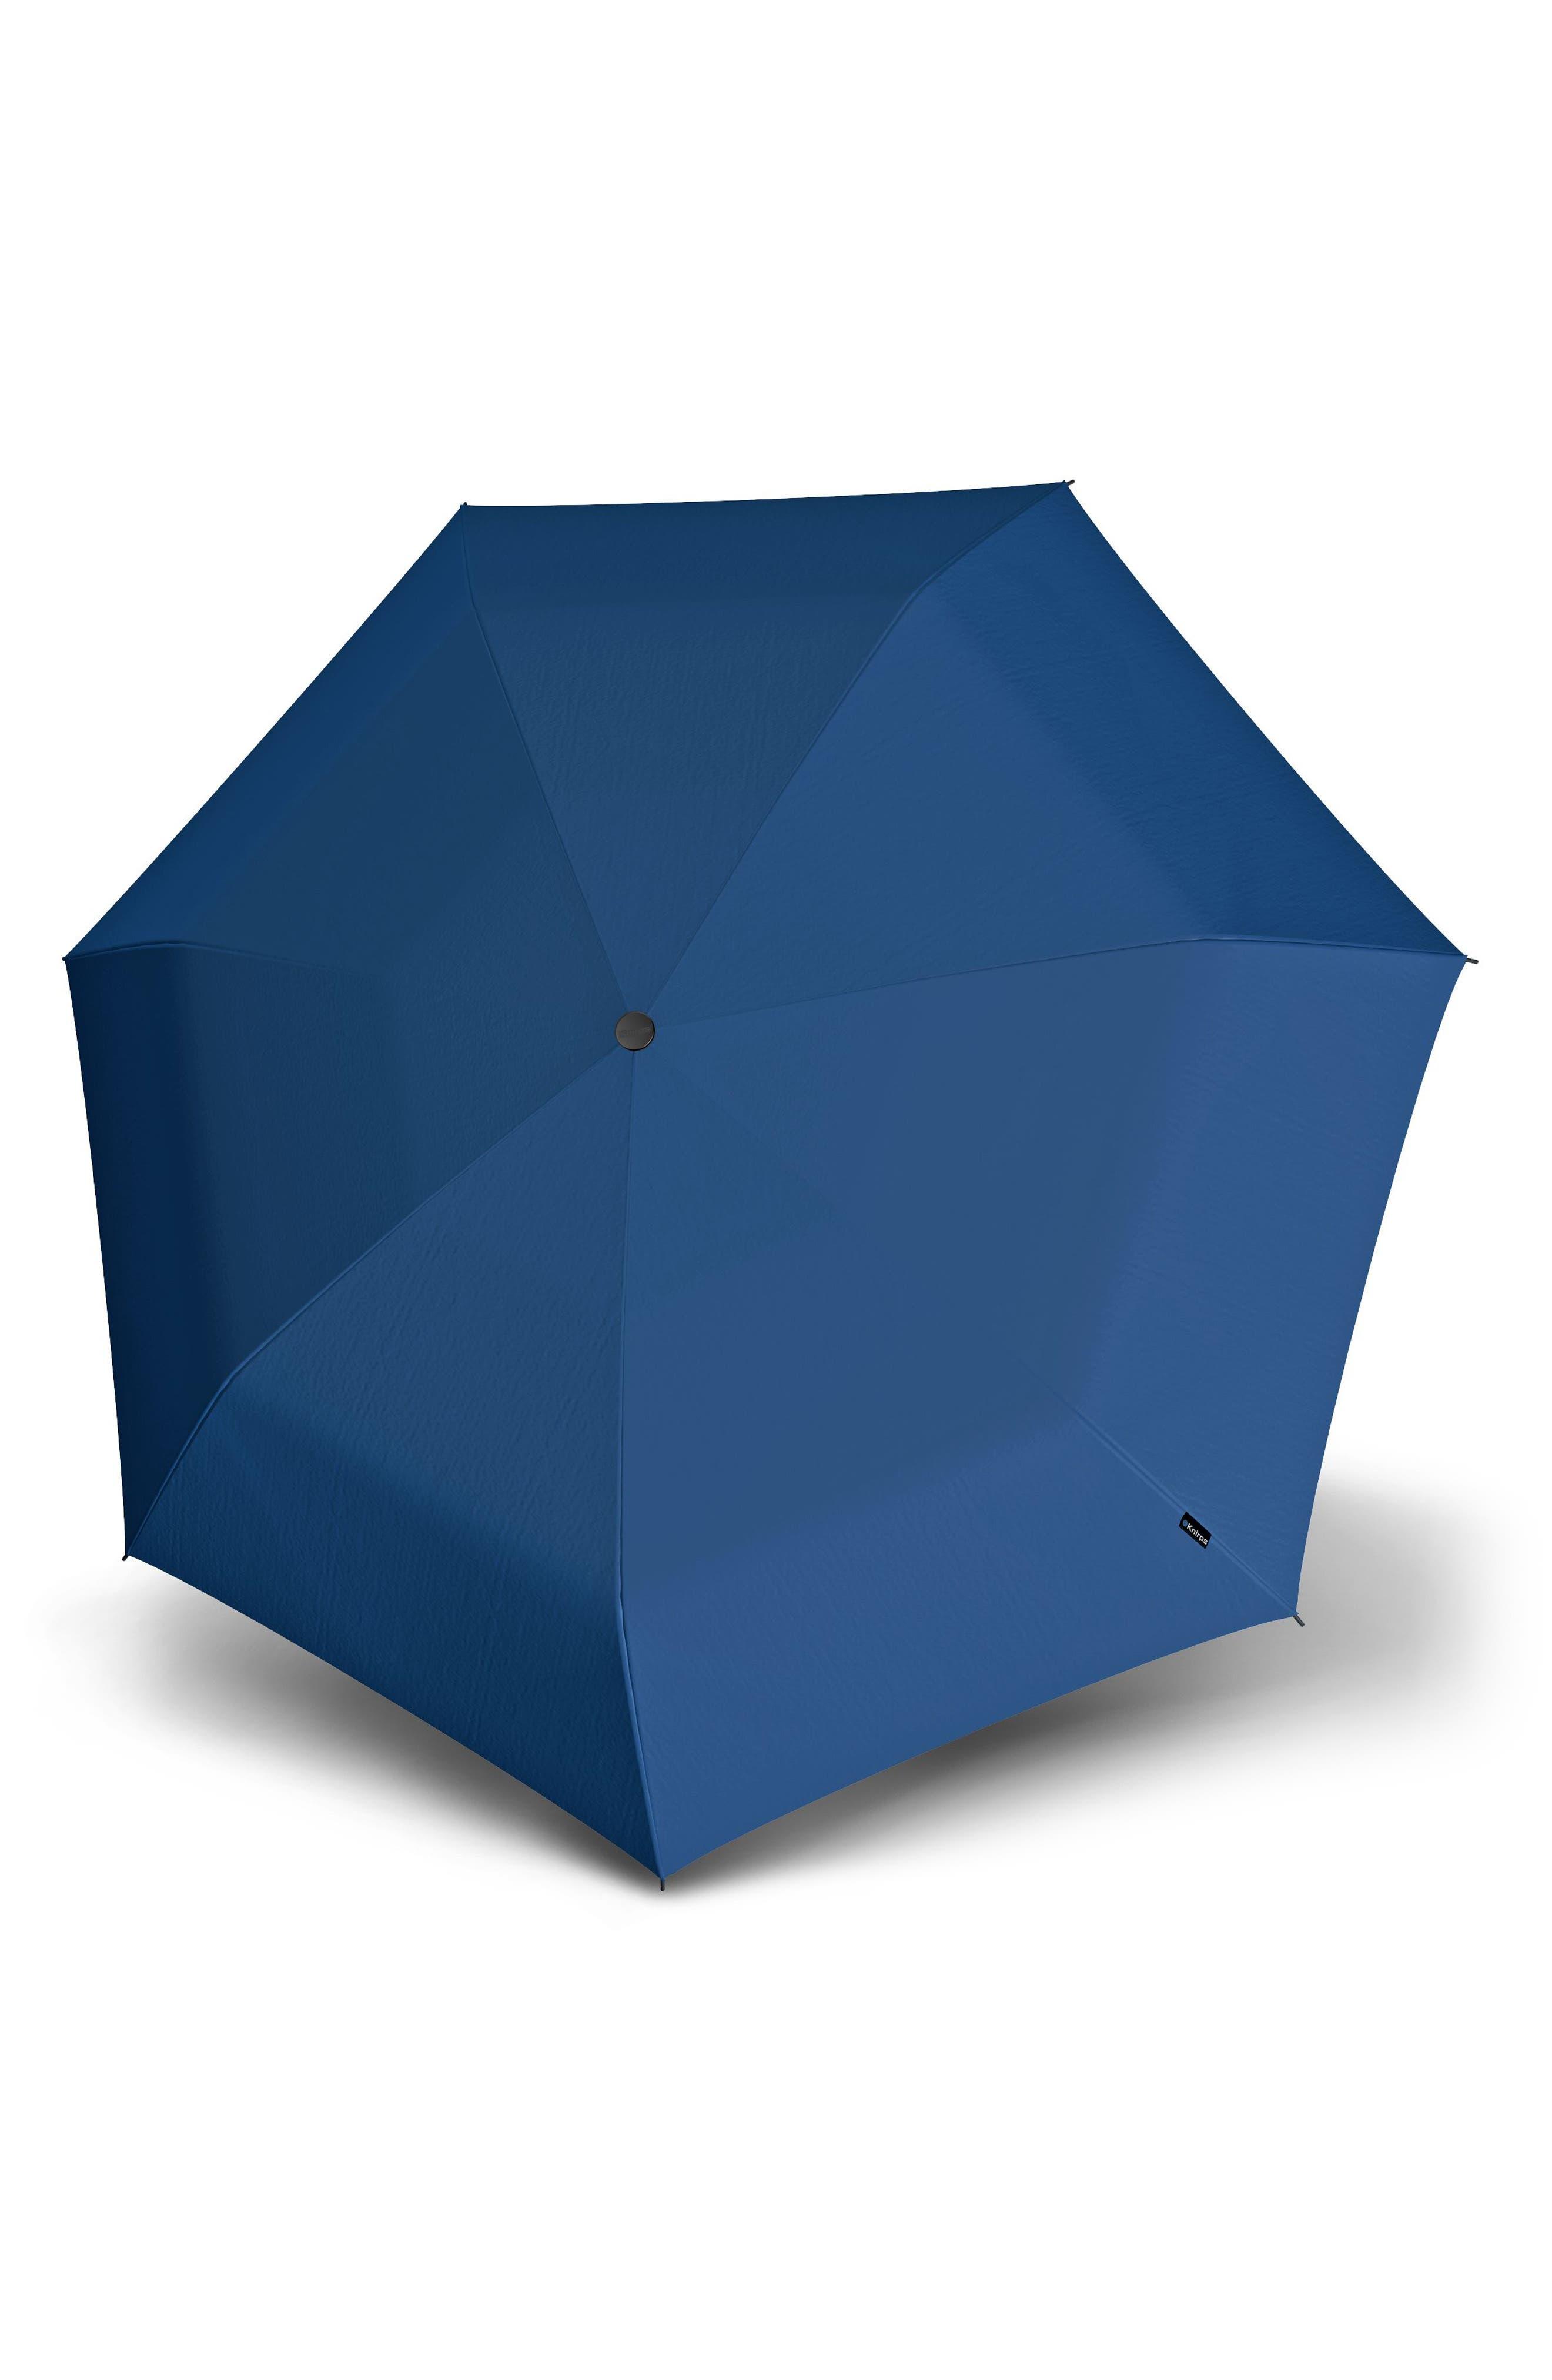 T2 Duomatic Compact Auto Open/Close Umbrella,                         Main,                         color, Ocean Blue